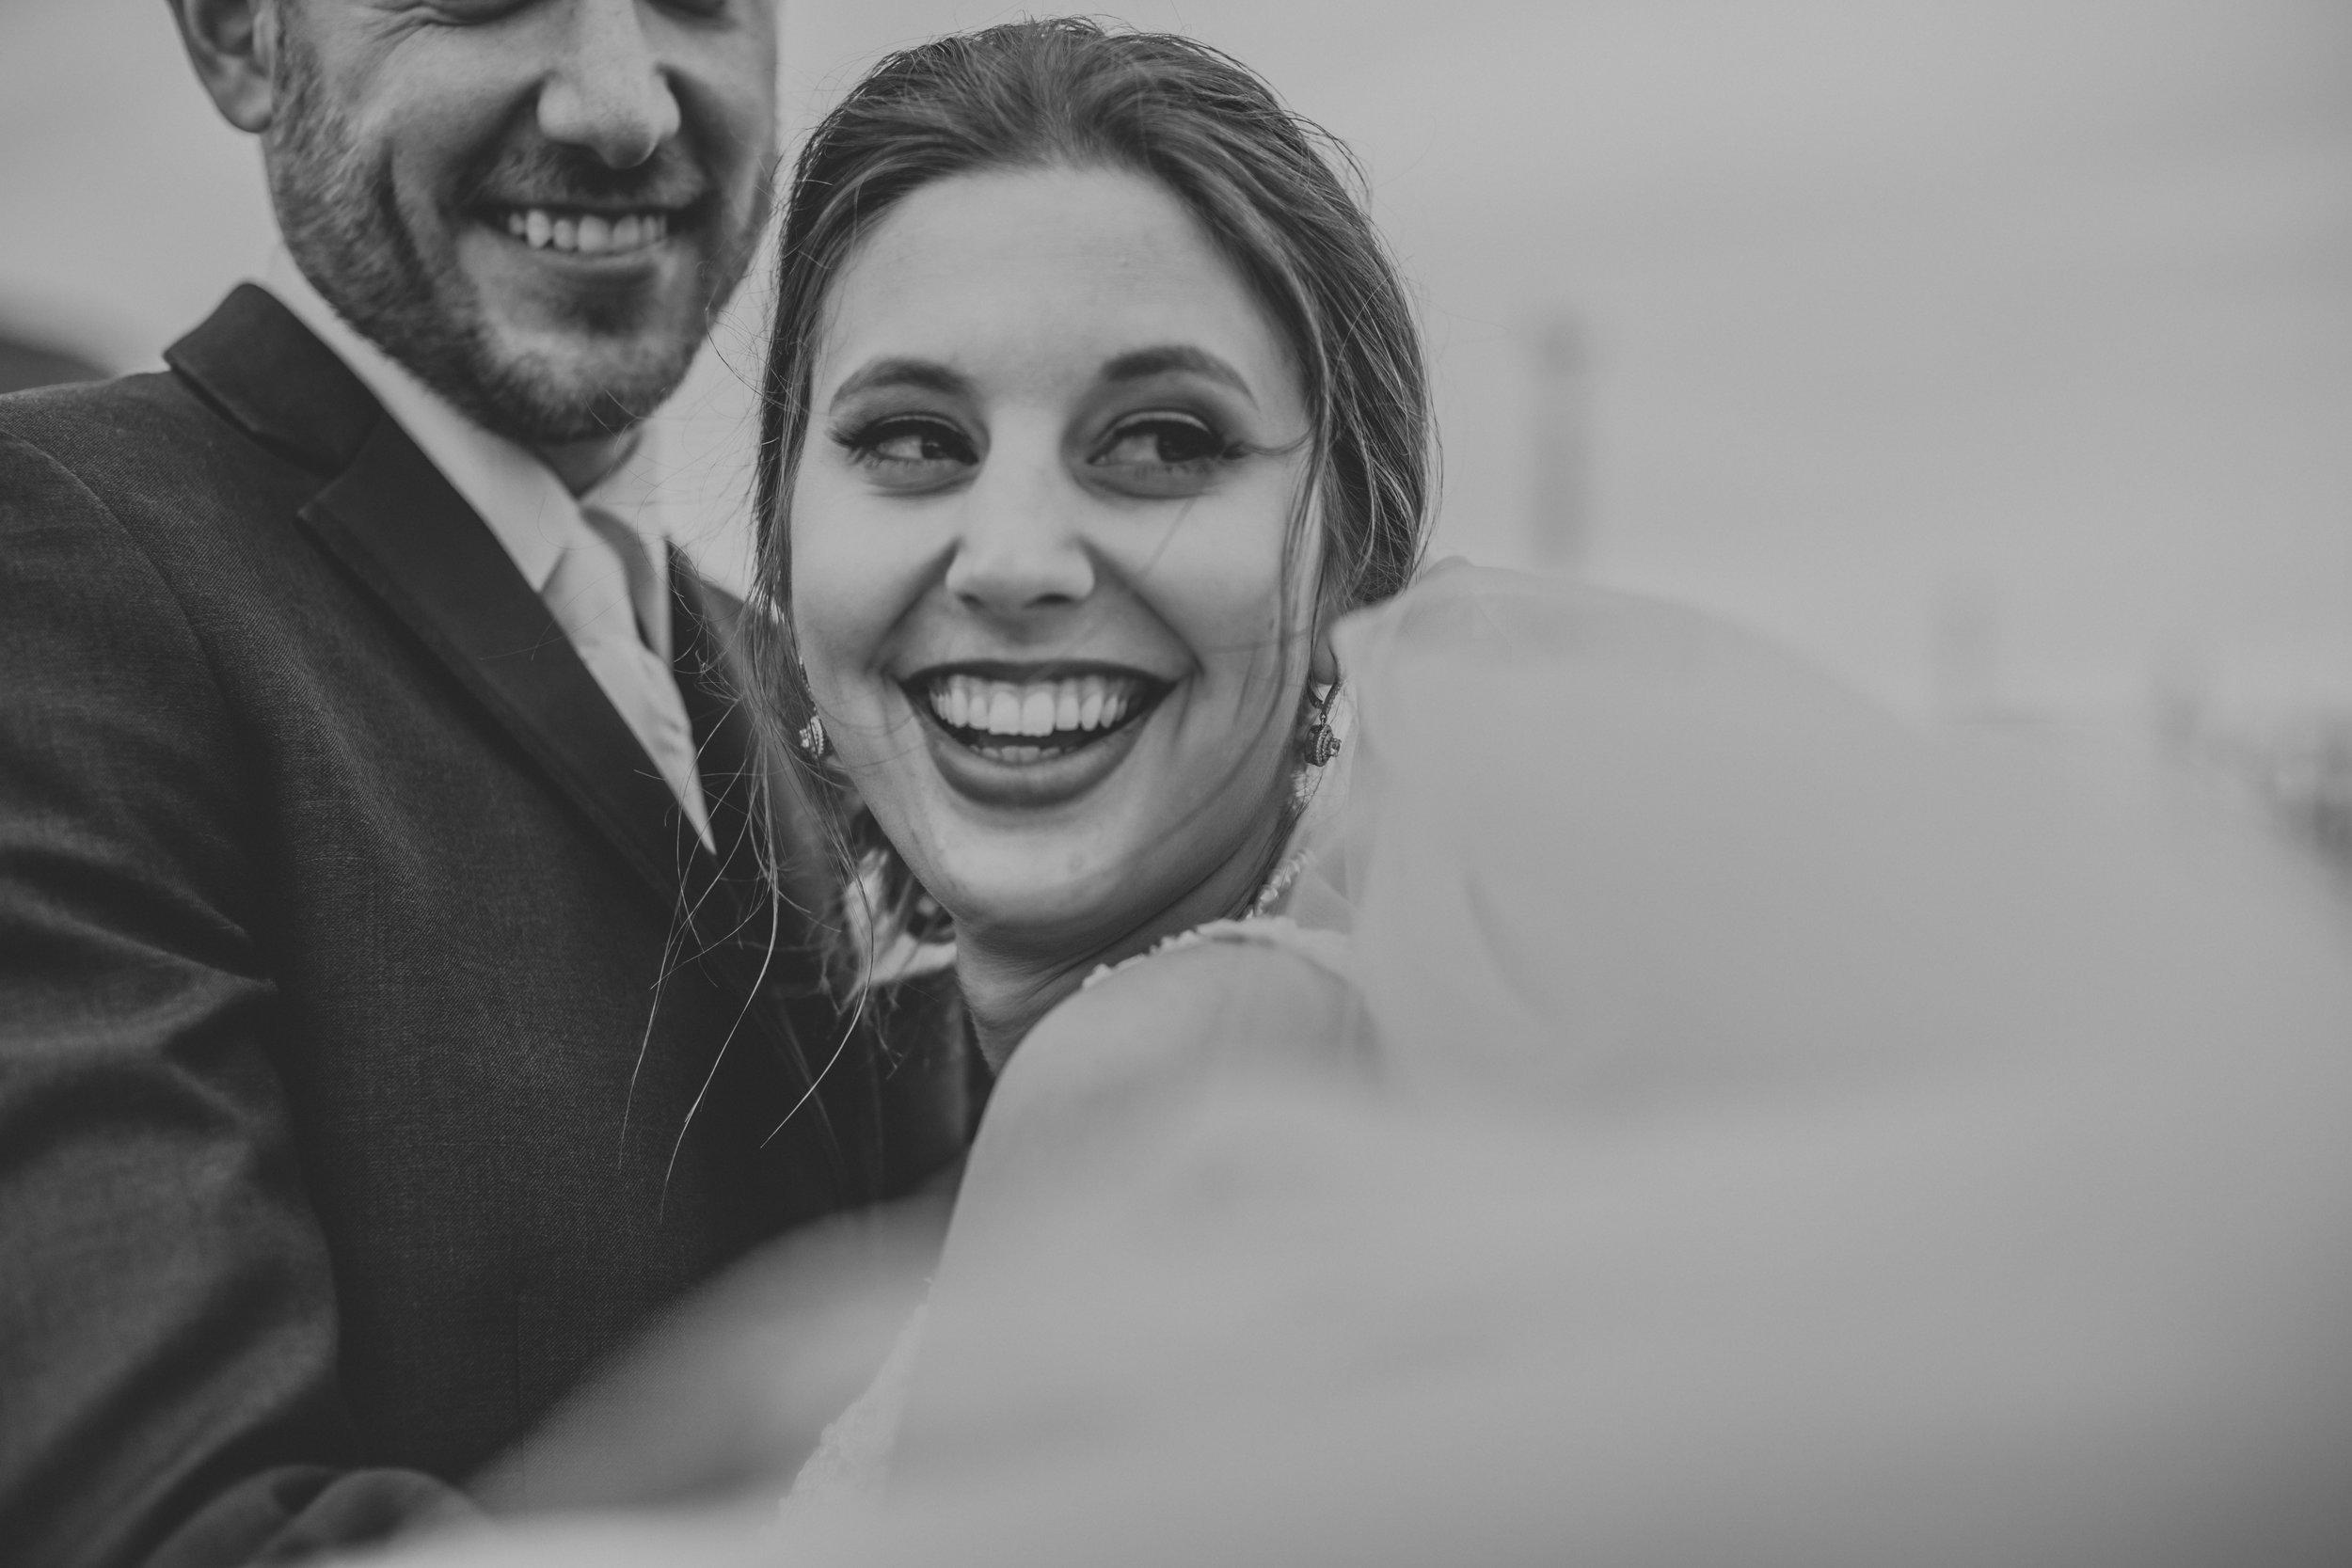 St. John's, Newfoundland wedding with smiling bride